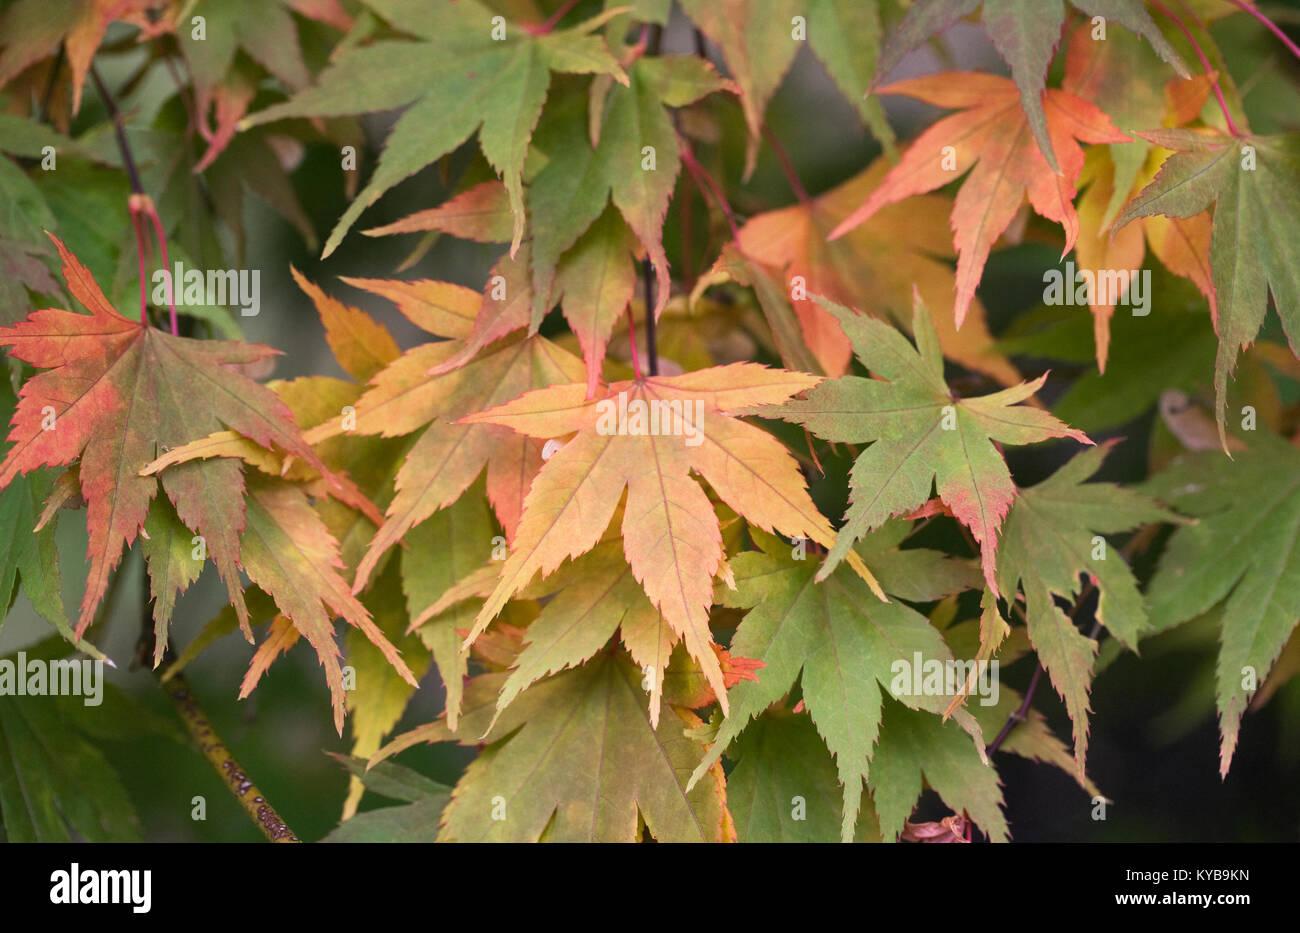 Acer Palmatum Killarney Leaves In Autumn Stock Photo 171738105